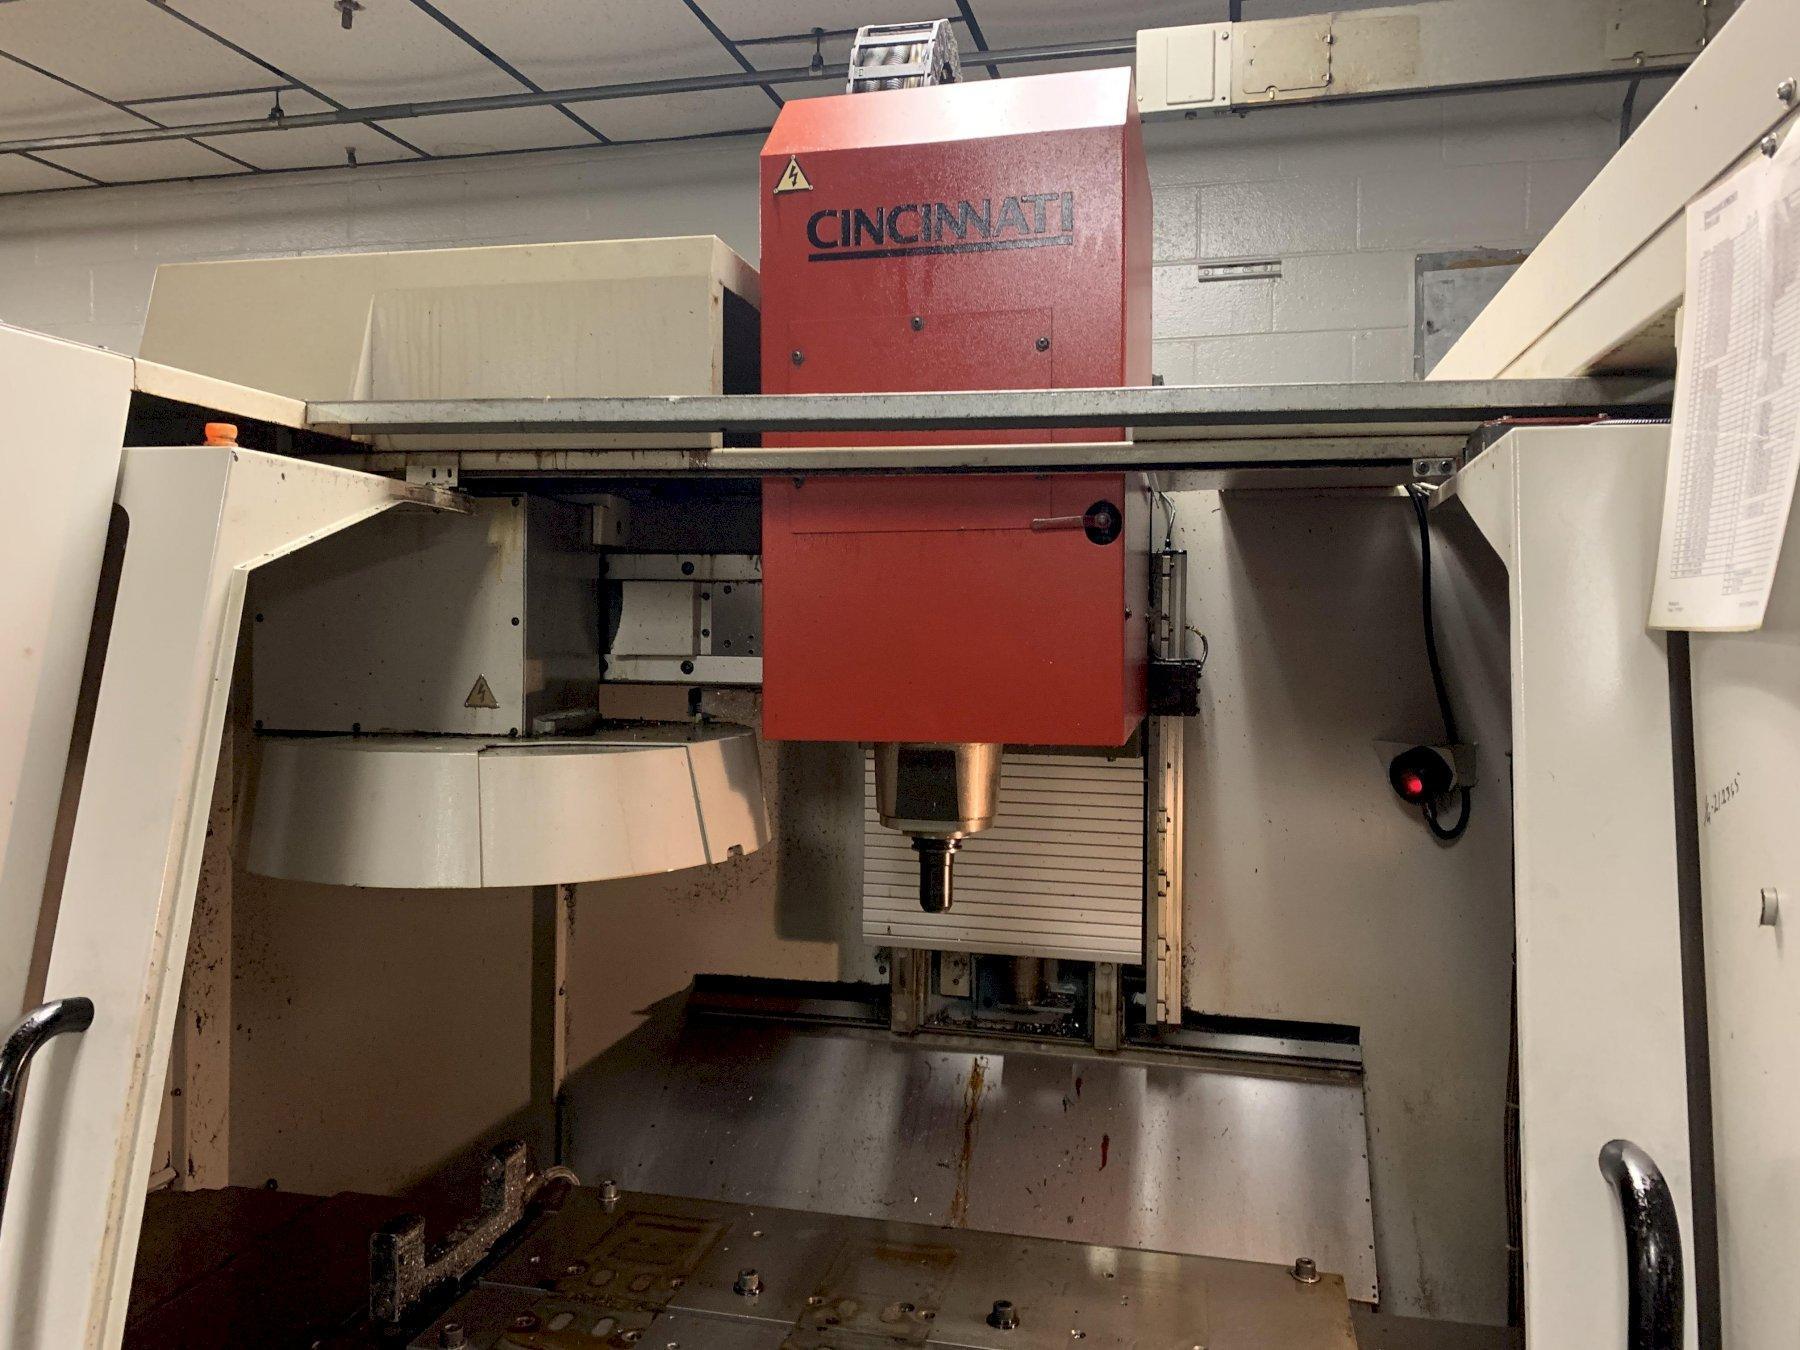 Cincinnati Arrow 1000 Vertical Machining Center with Fanuc 18i-M Control